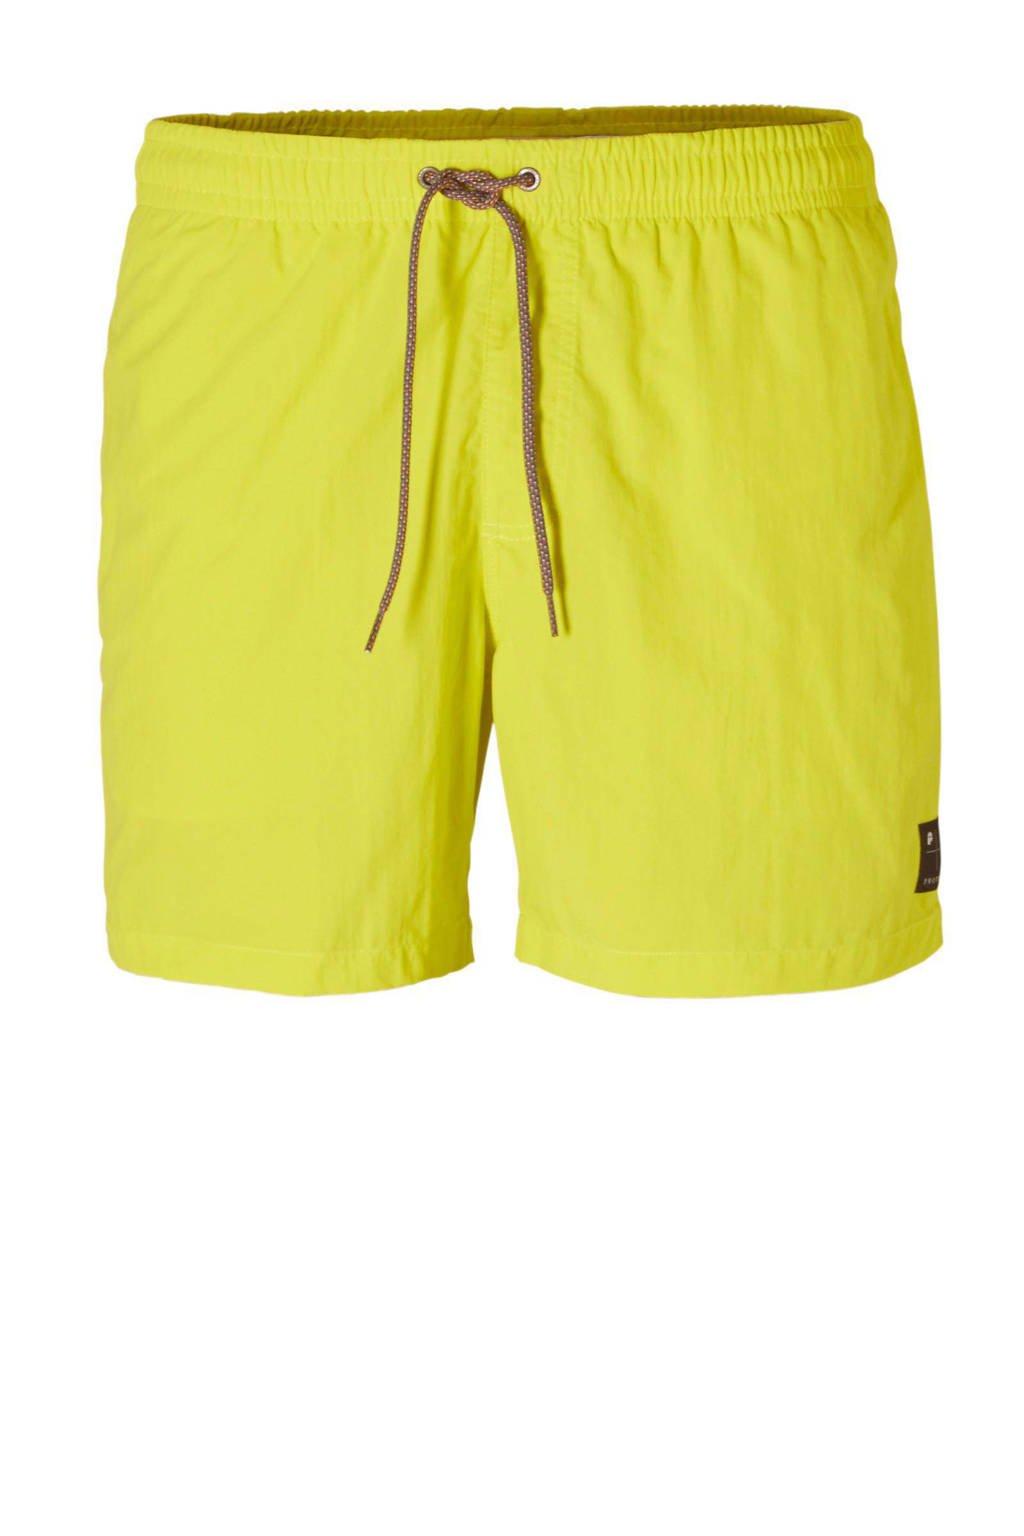 Protest zwemshort, Neon geel